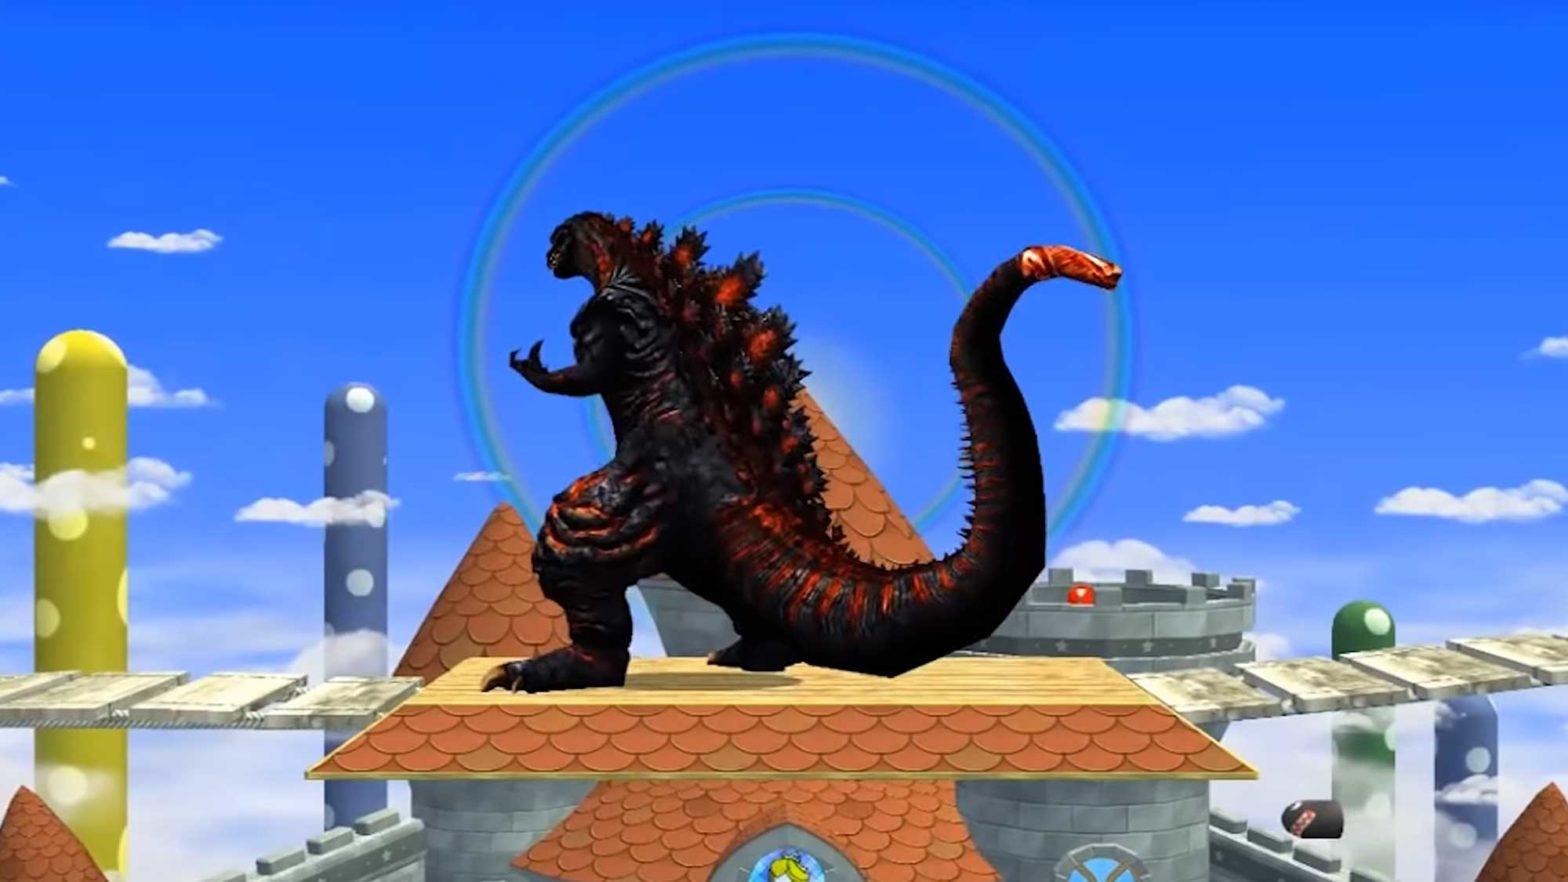 Shin Godzilla For Project M by Peperoncino